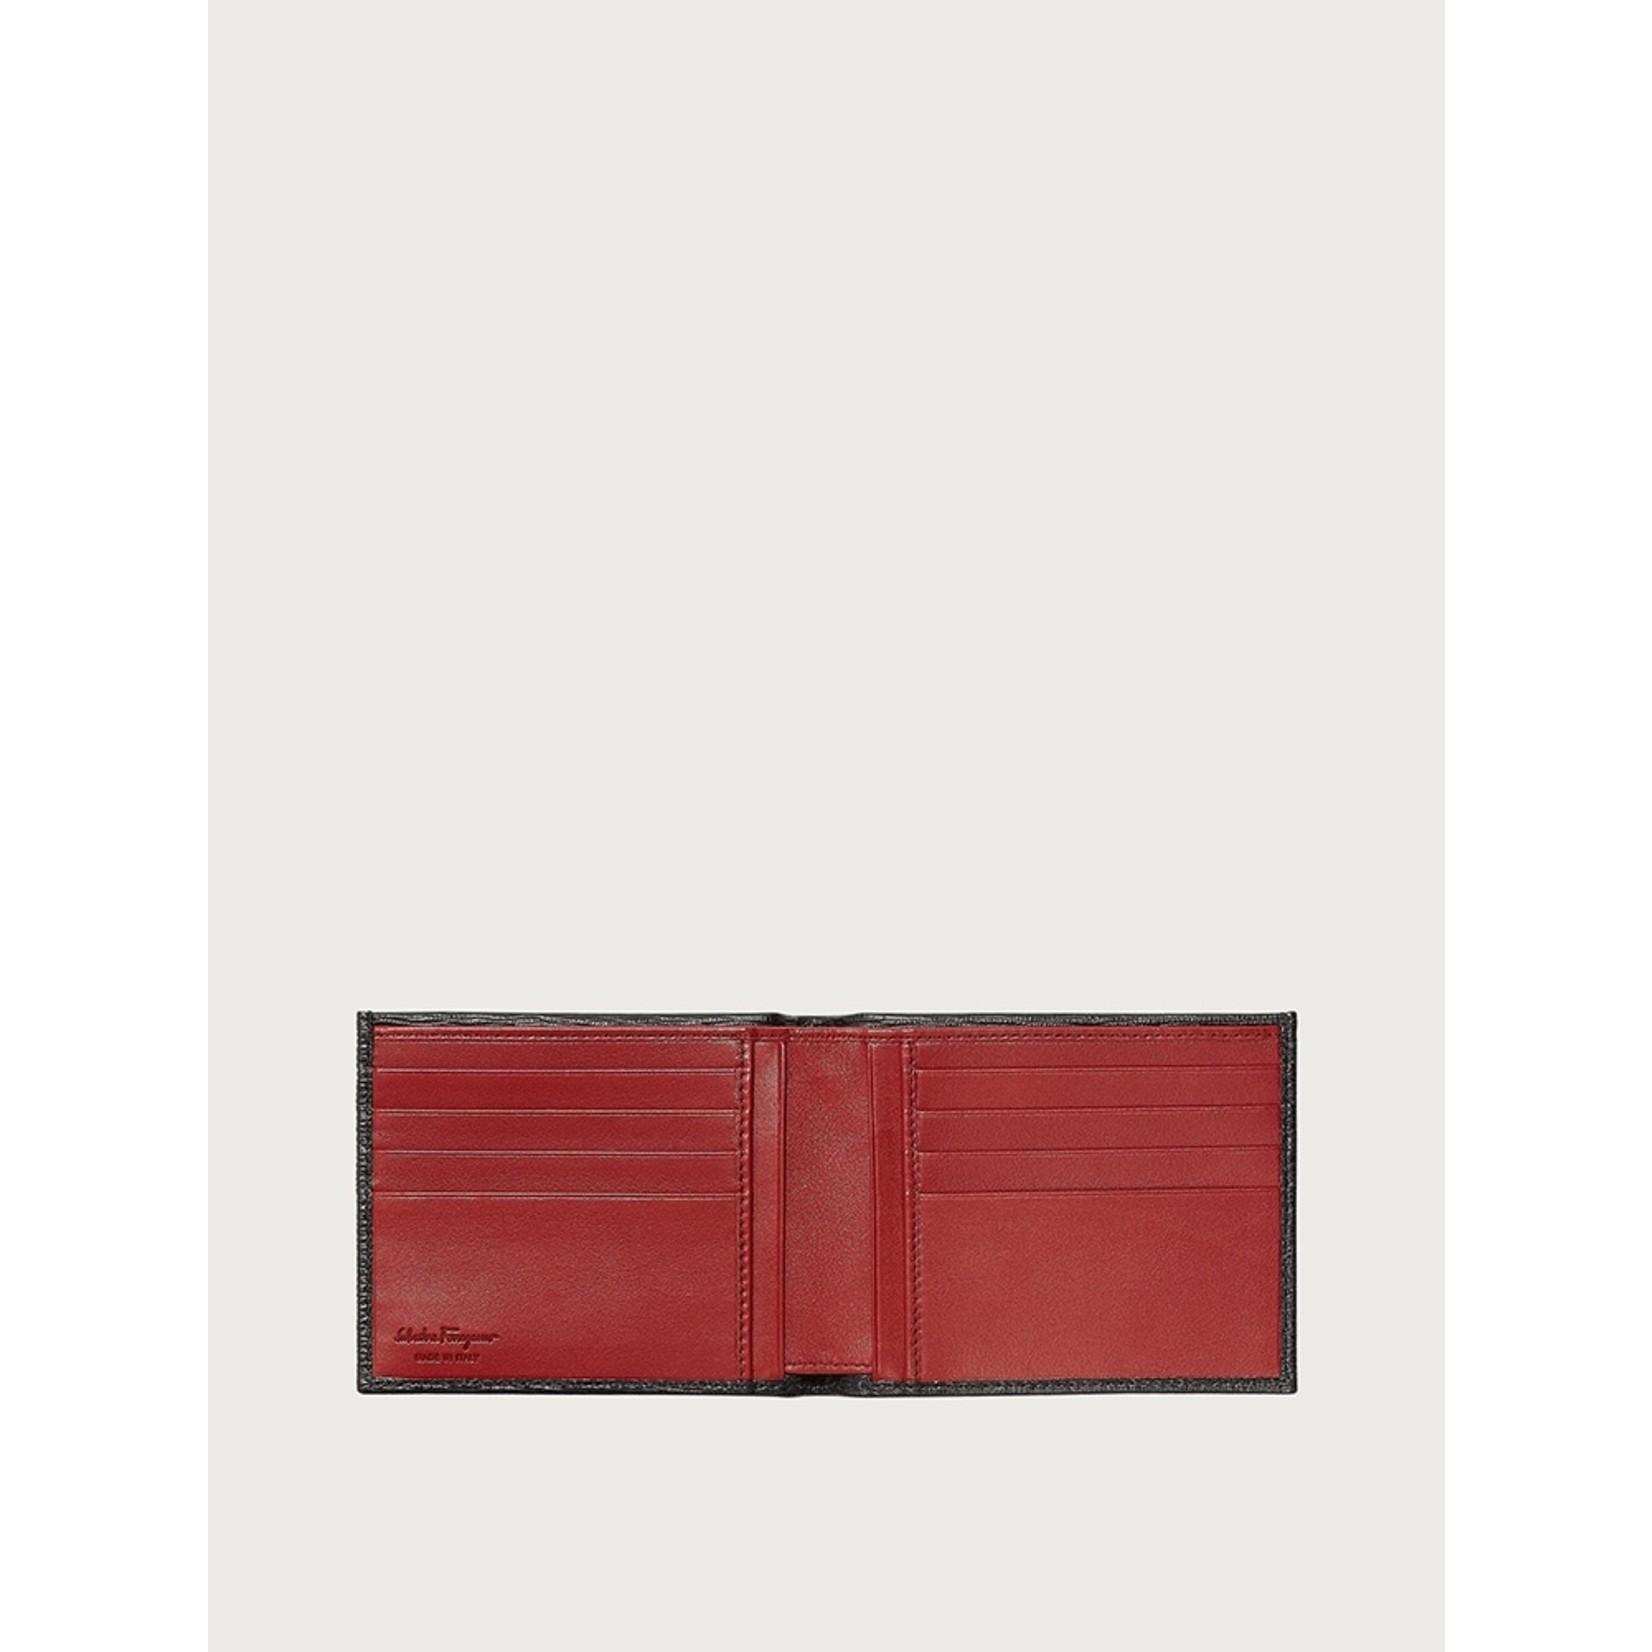 SALVATORE FERRAGAMO SALVATORE FERRAGAMO - CARD HOLDER REVIVAL 685956